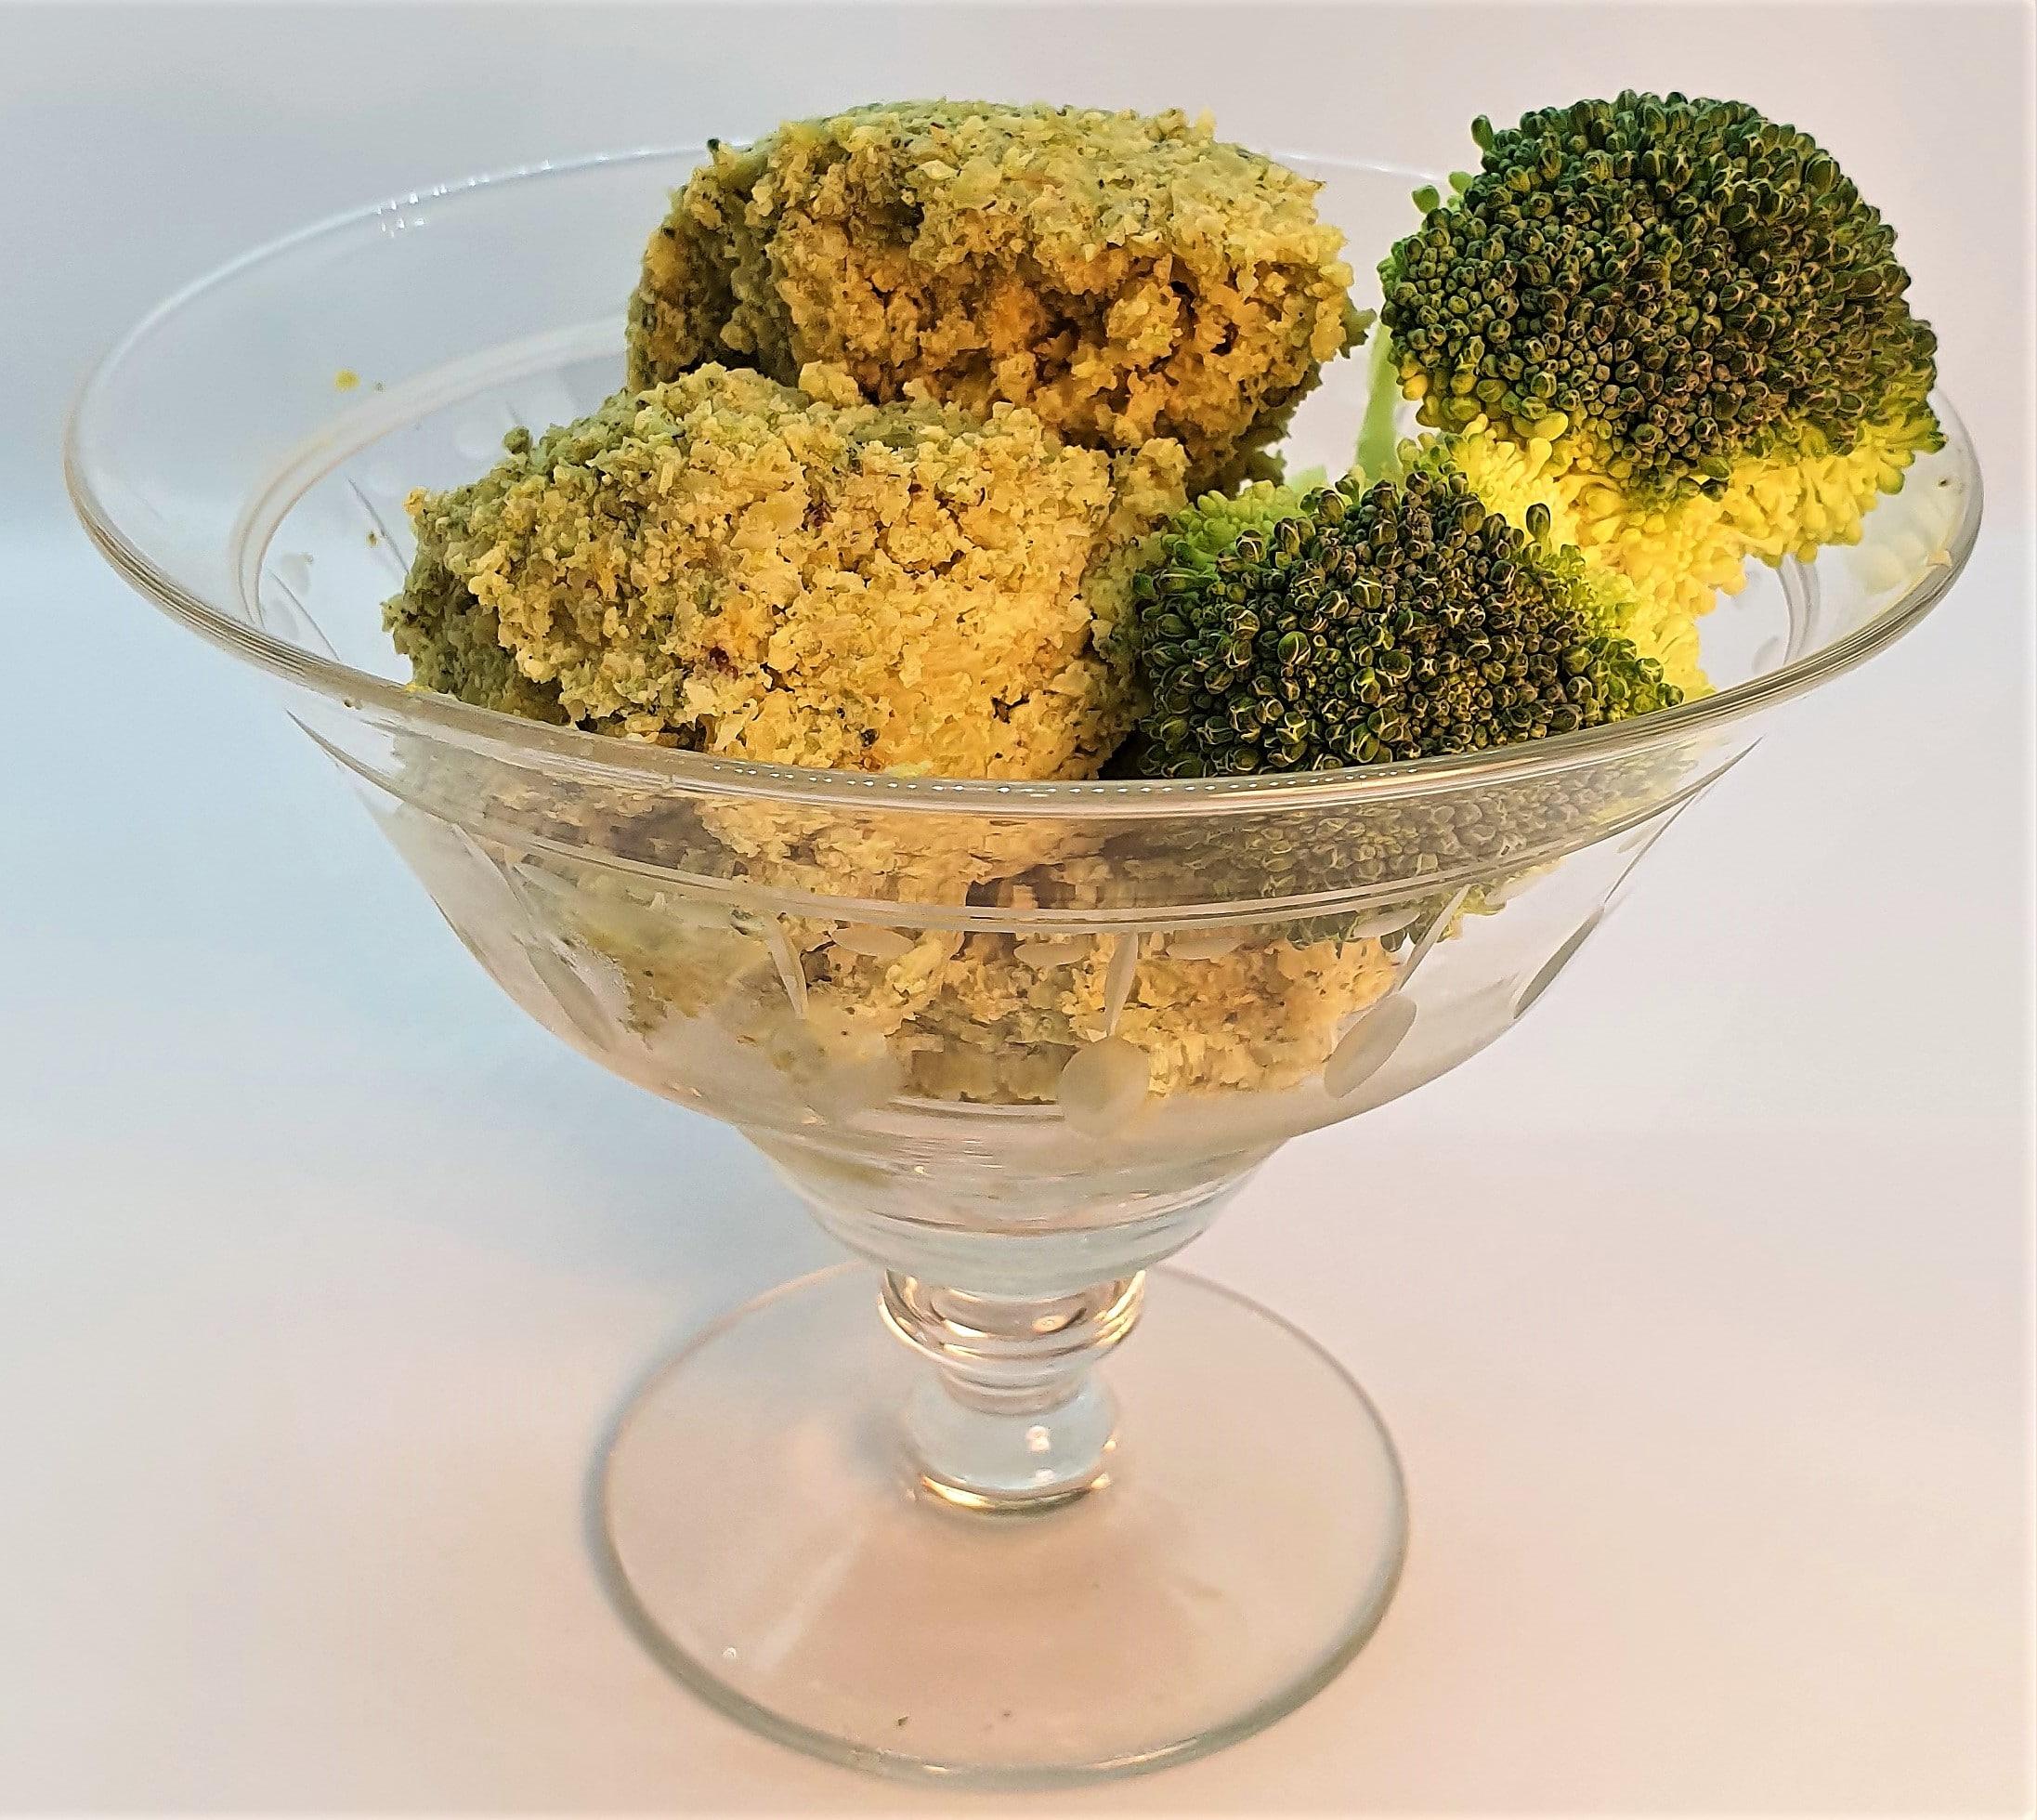 Broccoli ice cream